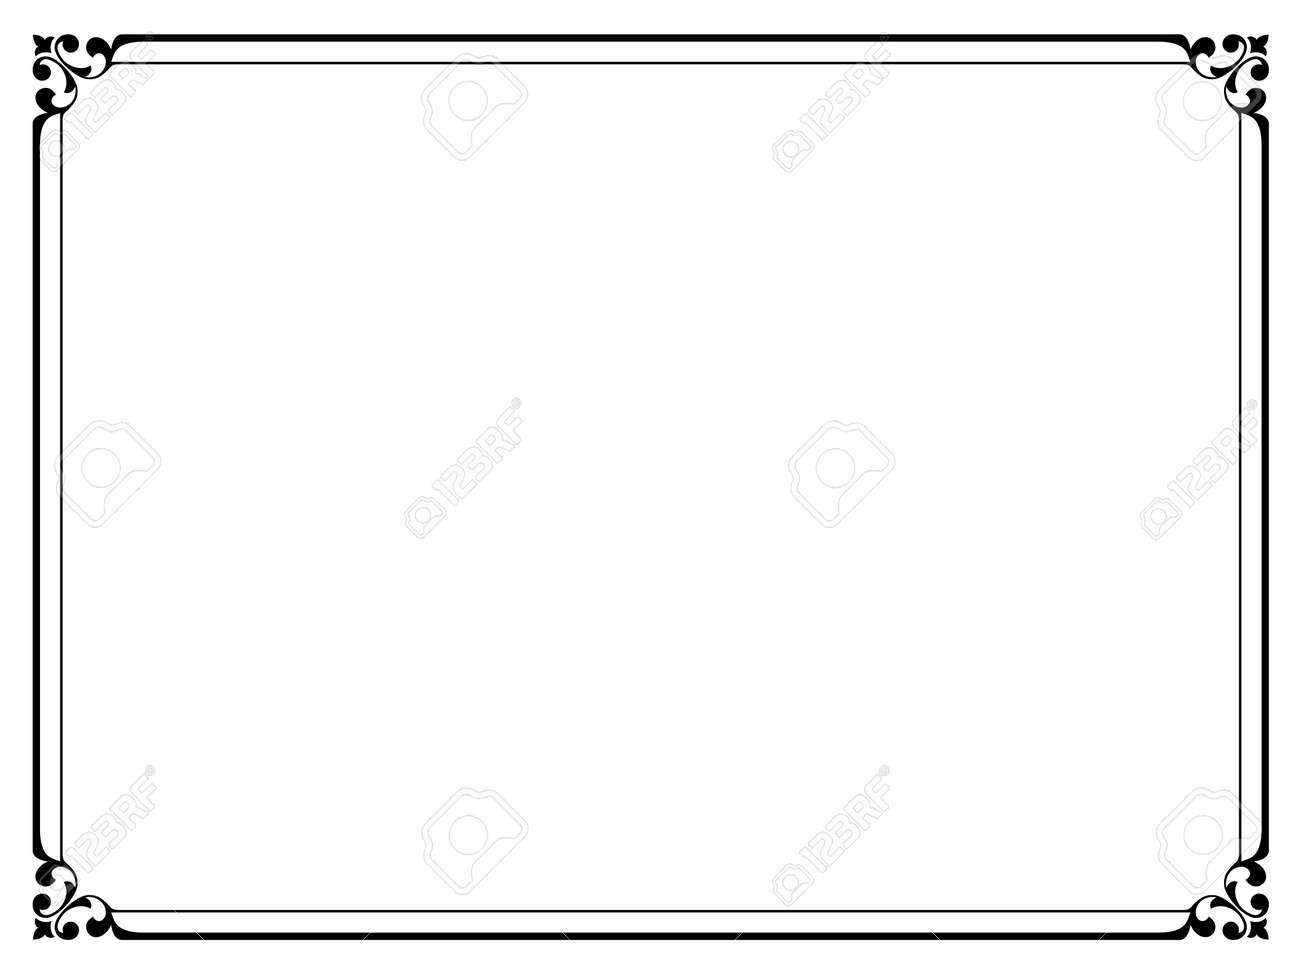 vector simple black calligraph ornamental decorative frame pattern